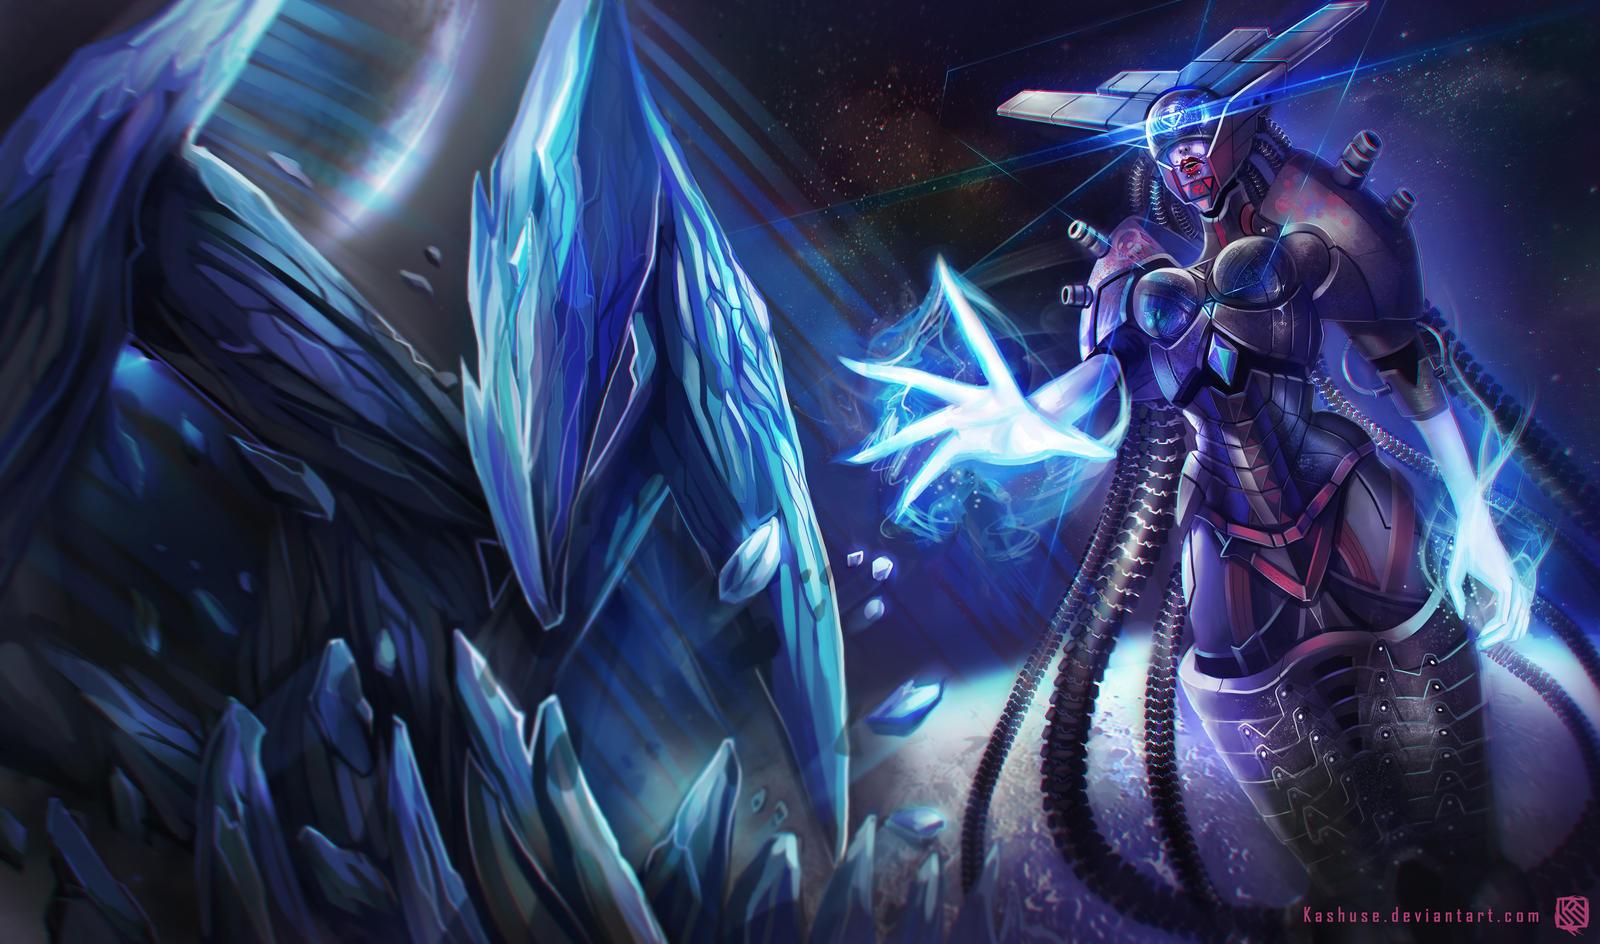 League of Legends_Lissandra_Space Cyborg_Splash by Kashuse ...